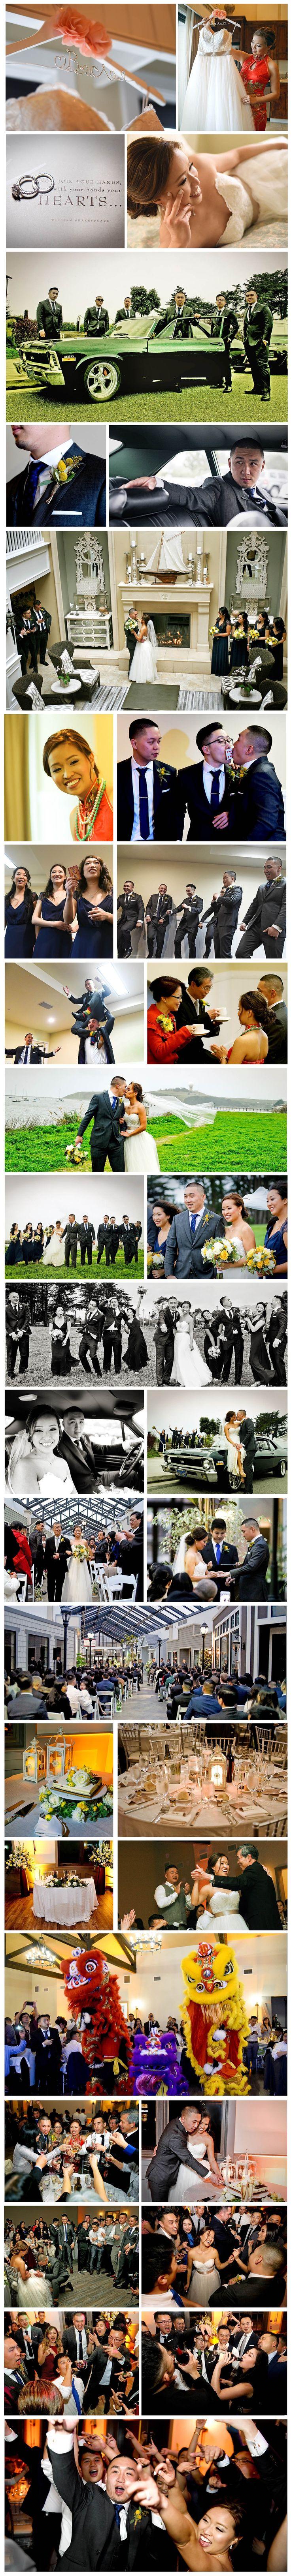 Oceano Hotel Wedding in Half Moon Bay - Kurty Photography Blog - Kurty Photography